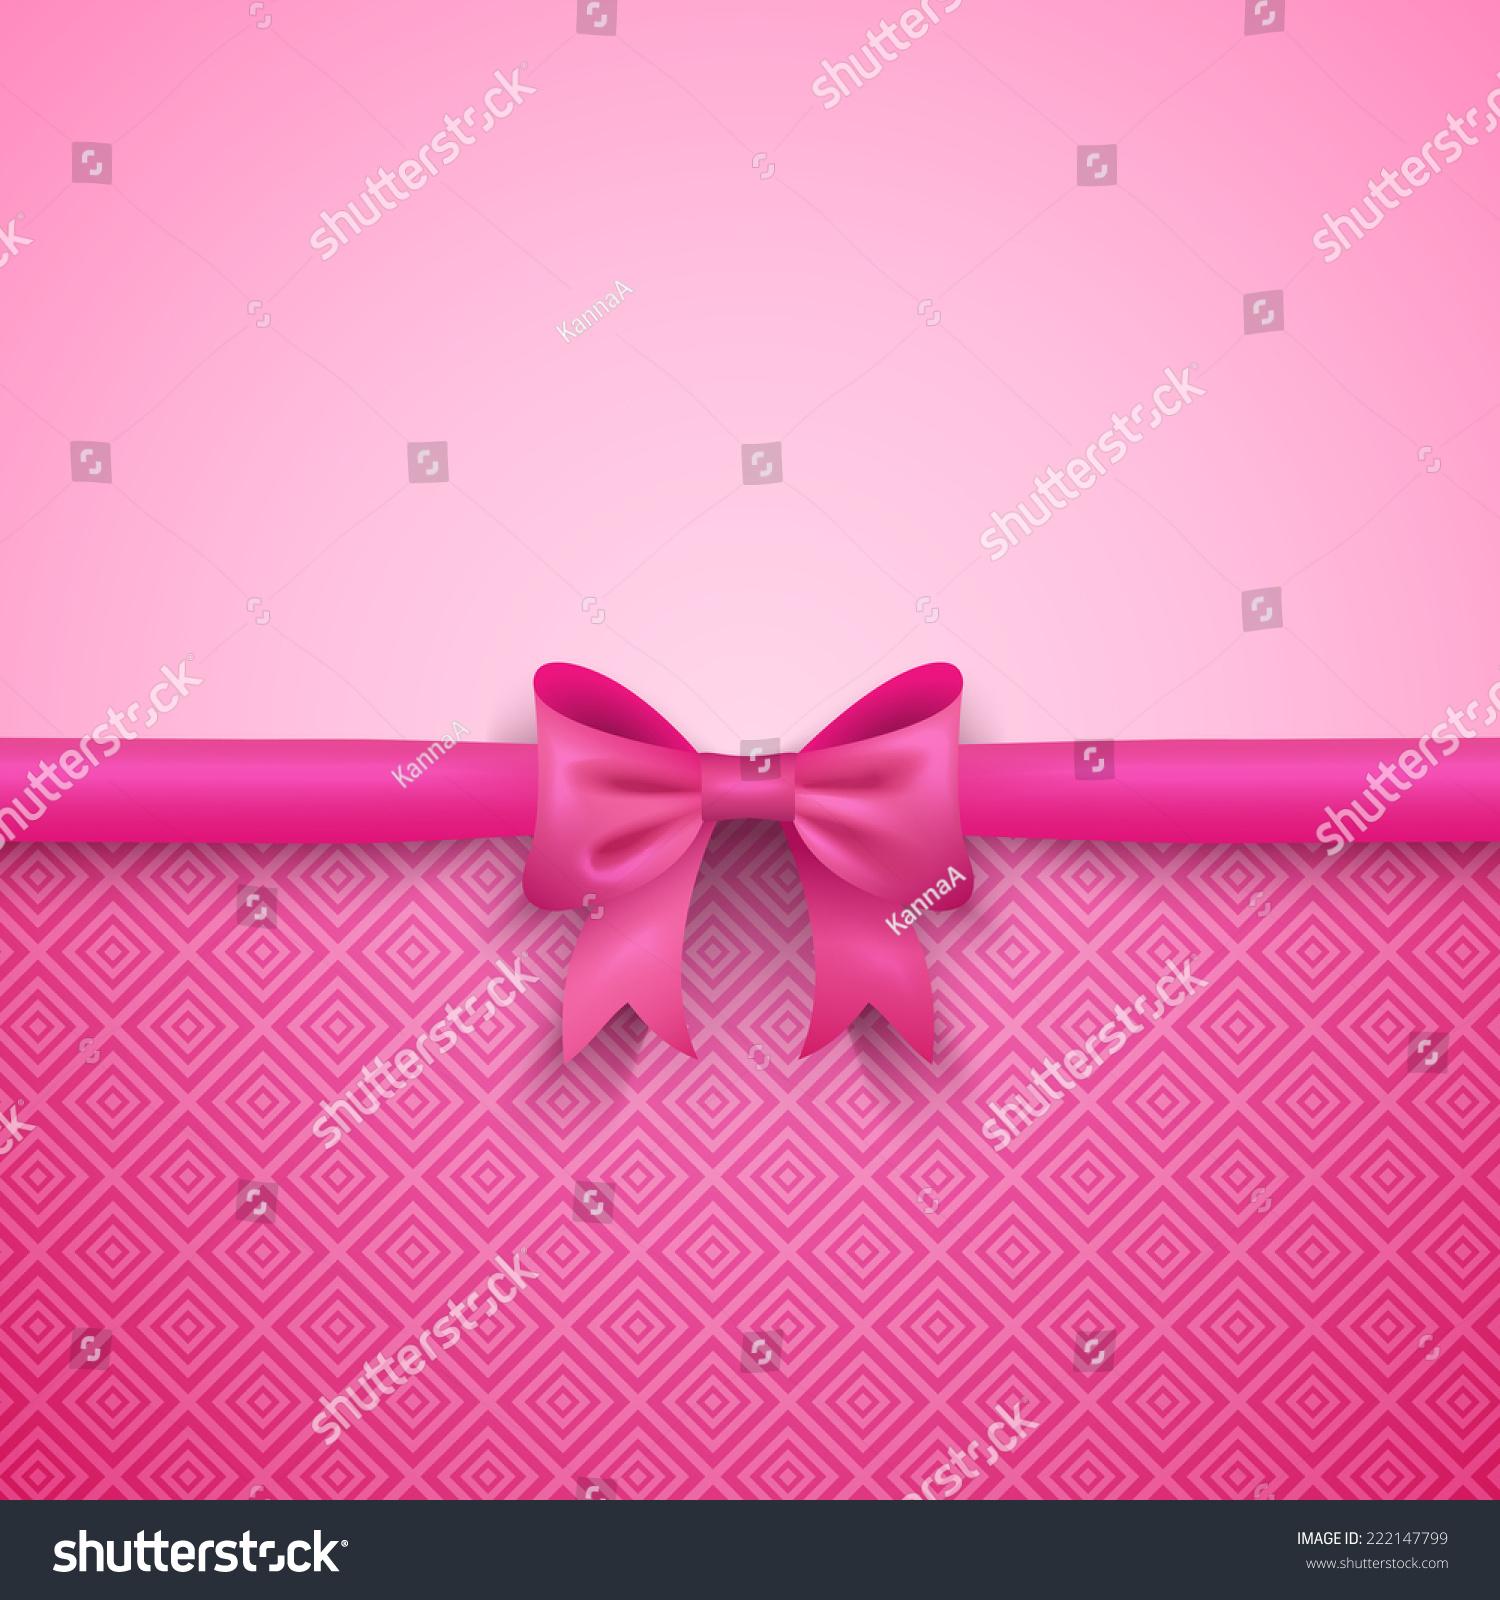 Pink Bow Pattern Wallpaper